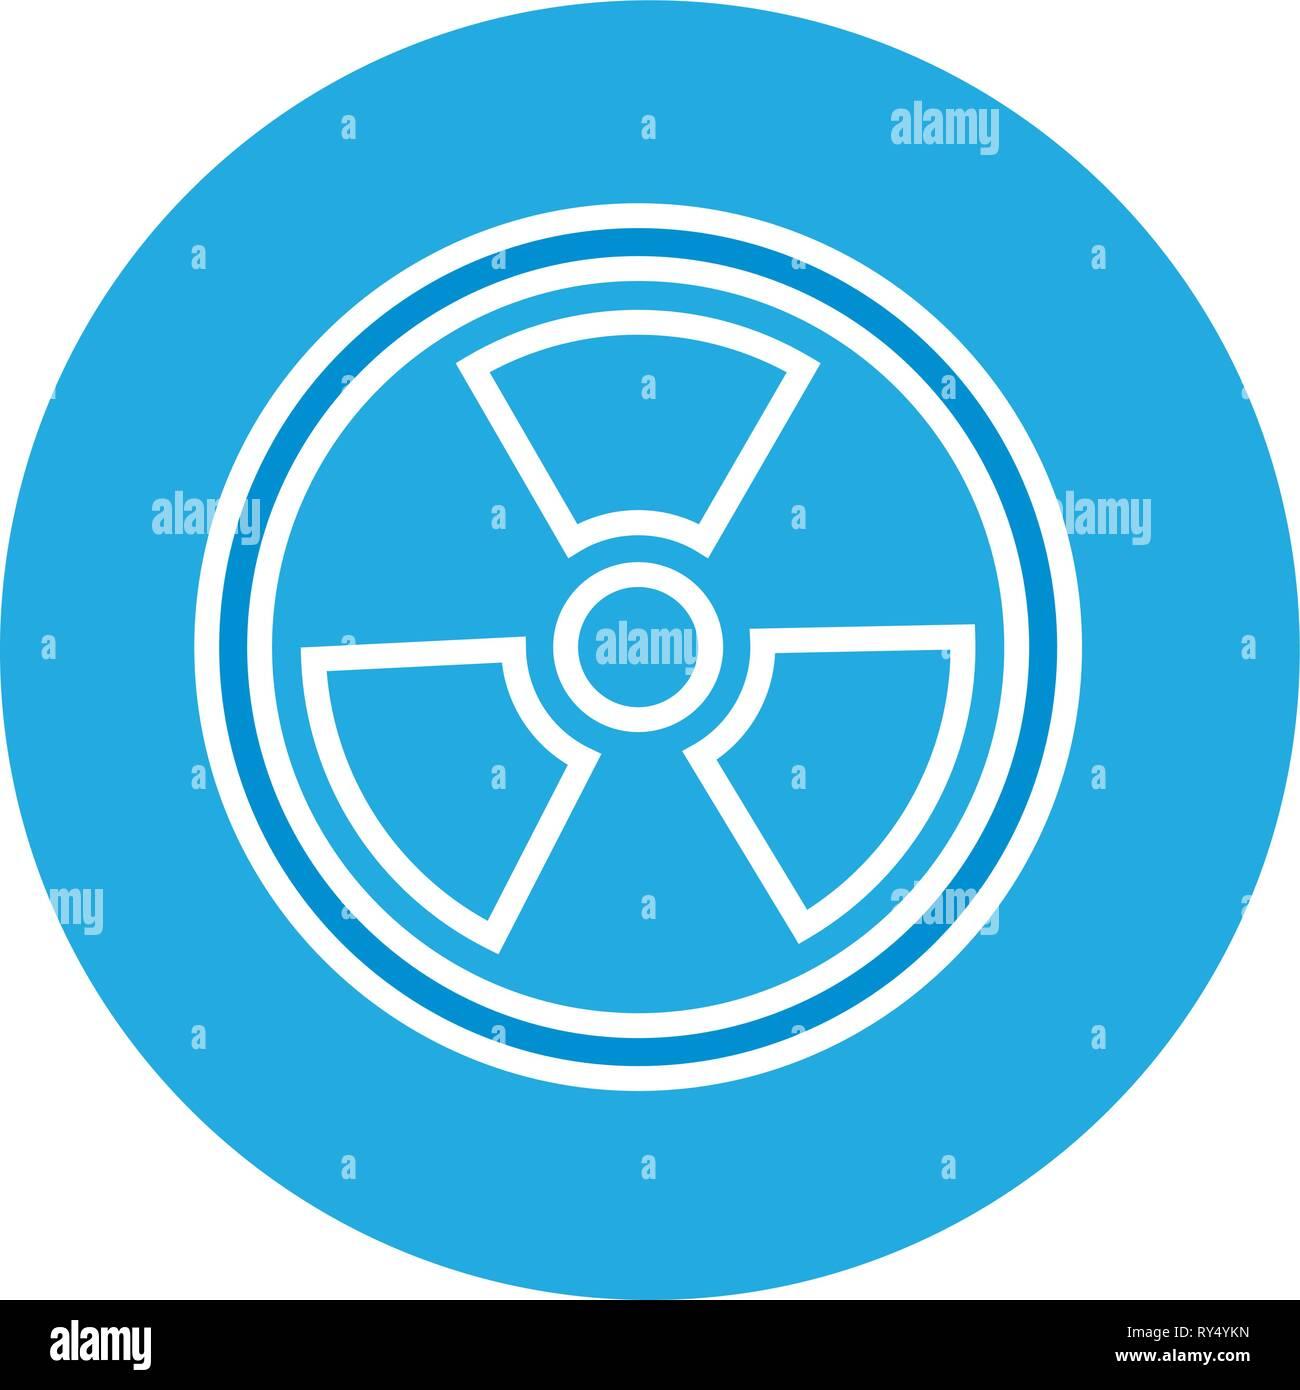 radiation symbol science - Stock Image